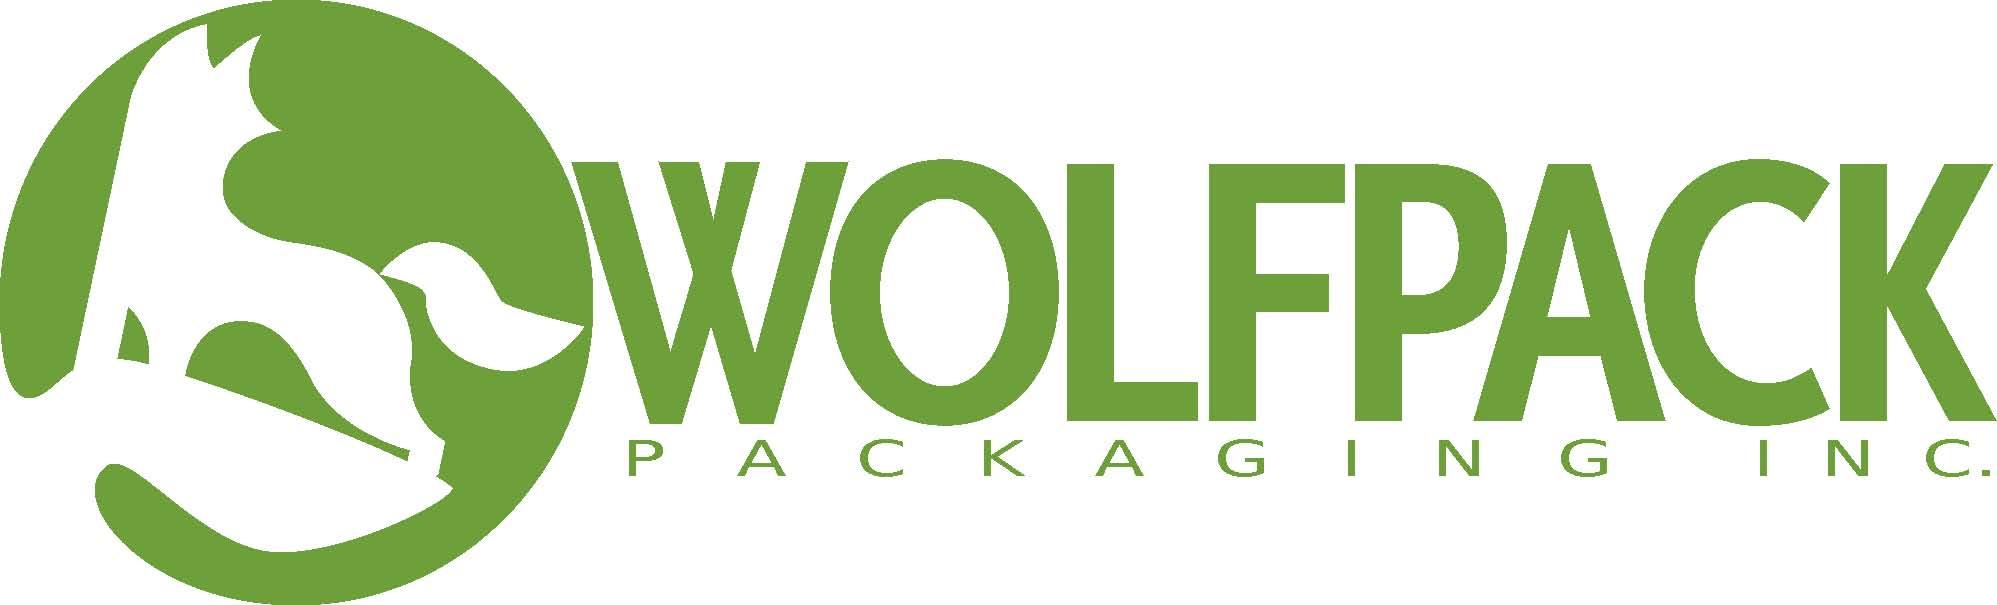 Wolfpack Inc.